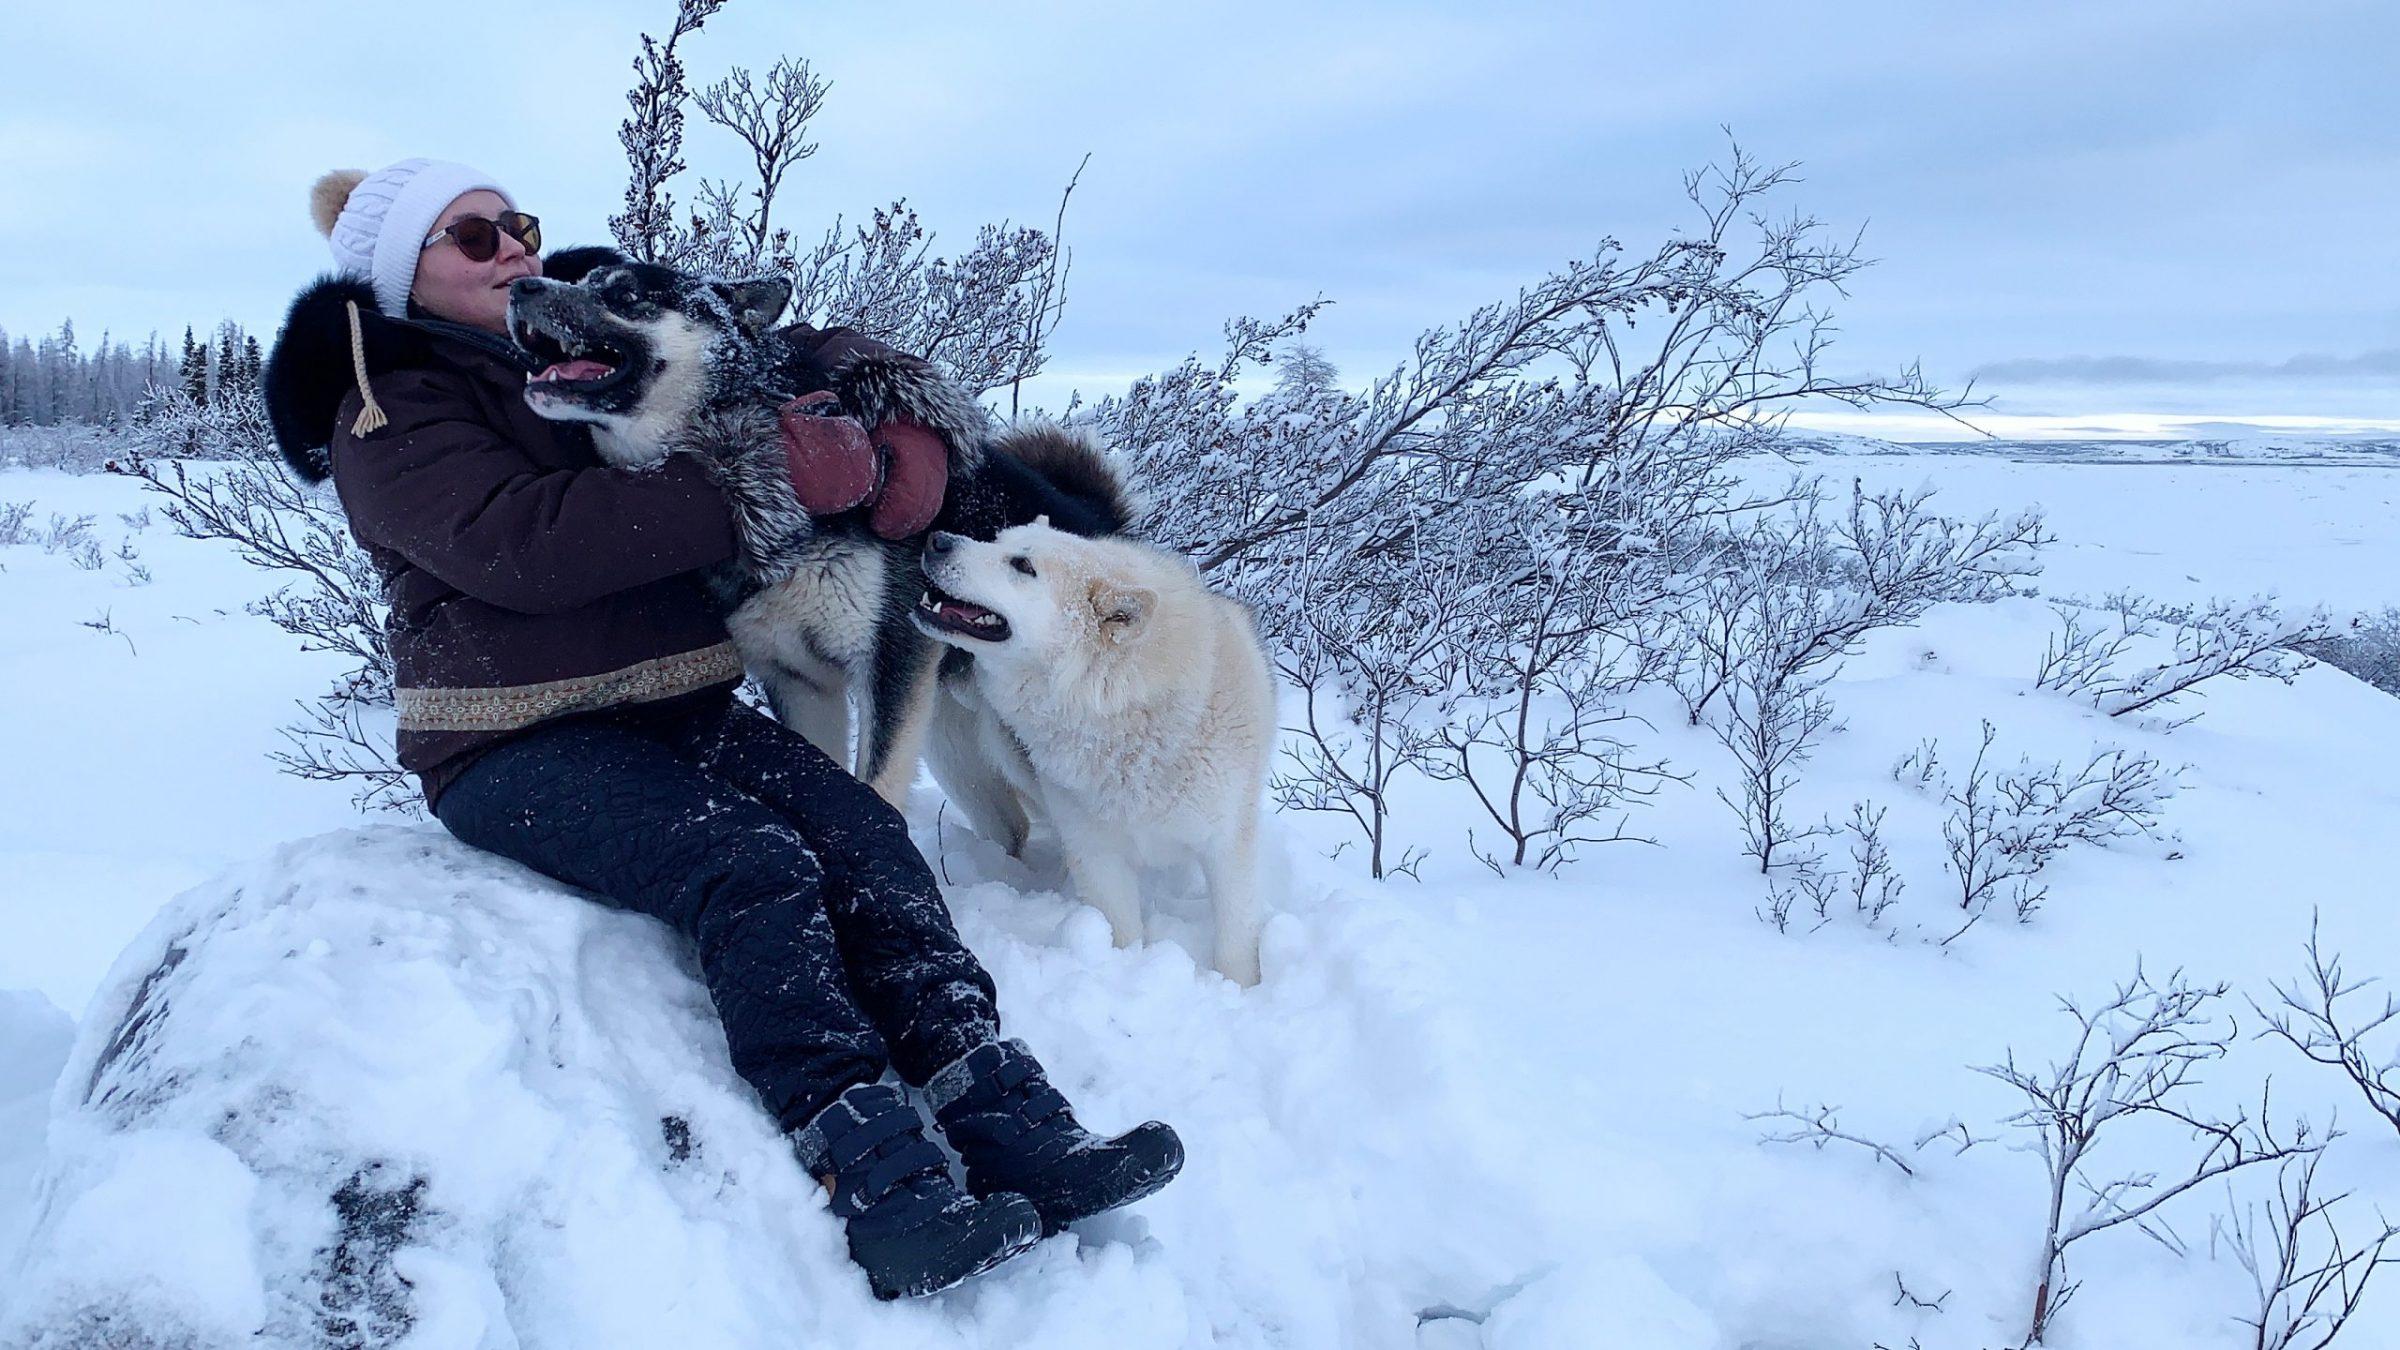 Lavinia Flaherty of Kuujjuaq takes her two huskies, Chubby and Hunter, for a walk and snuggle Jan 26. (Photo by Malaya Qaunirq Chapman)